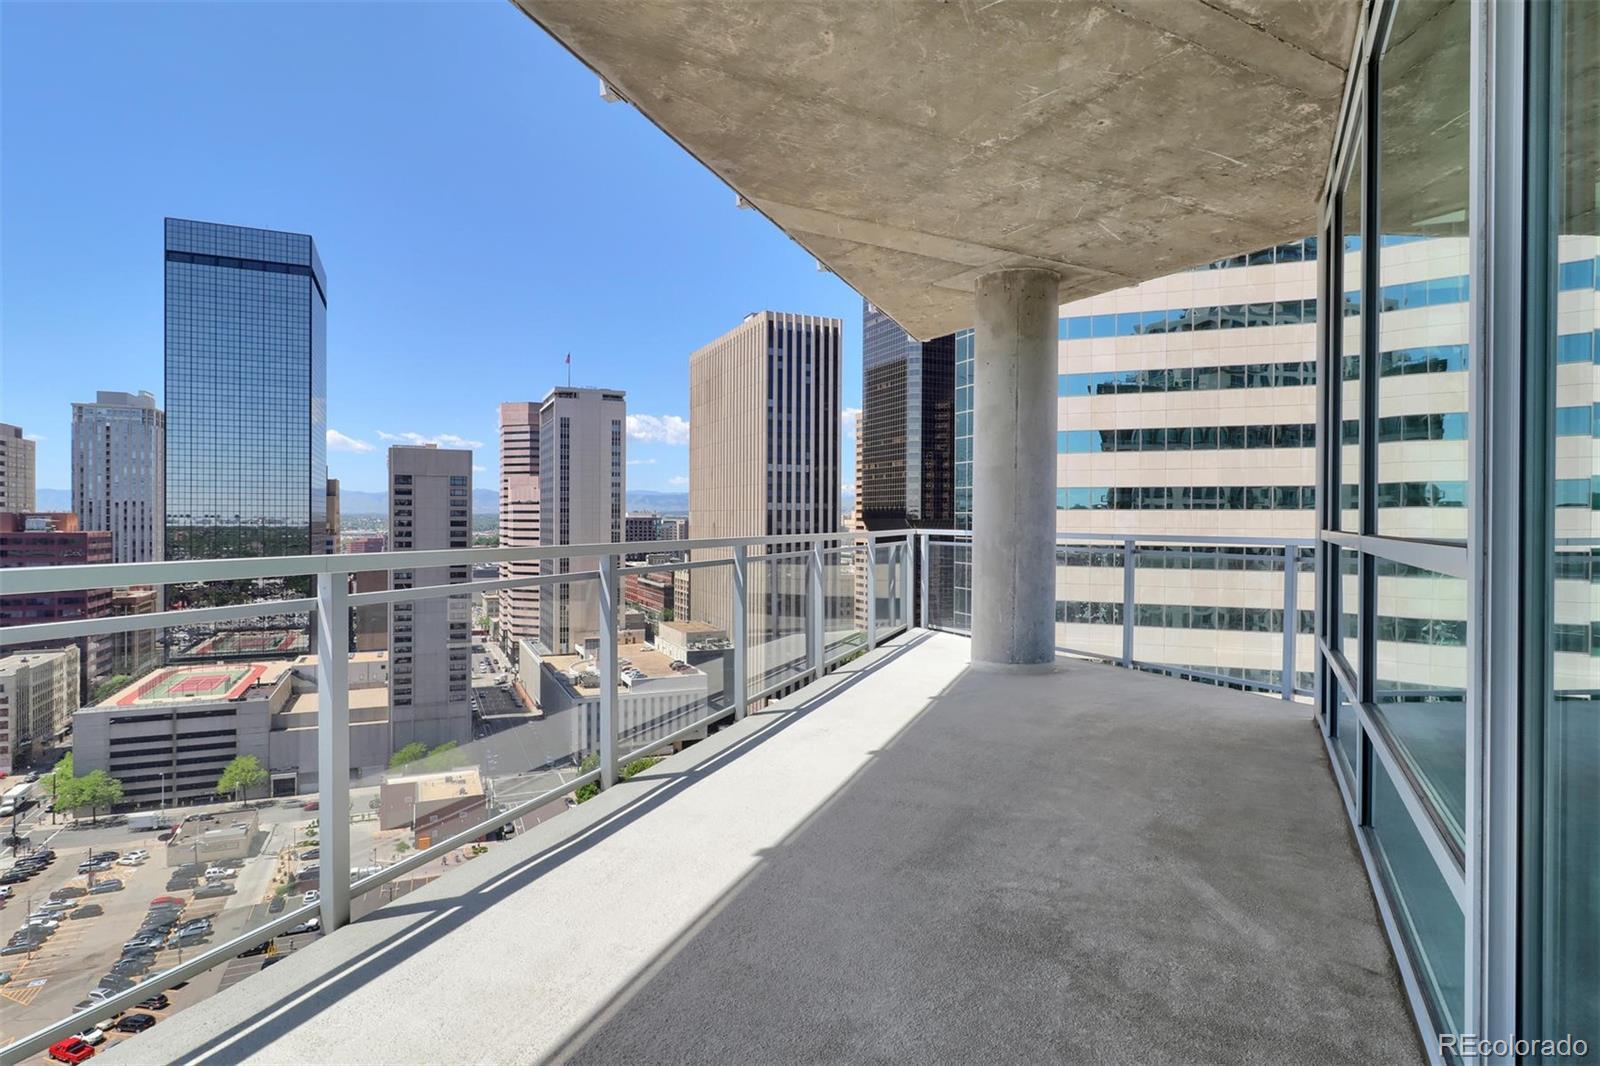 MLS# 7793144 - 24 - 2001 Lincoln Street #2011-L, Denver, CO 80202